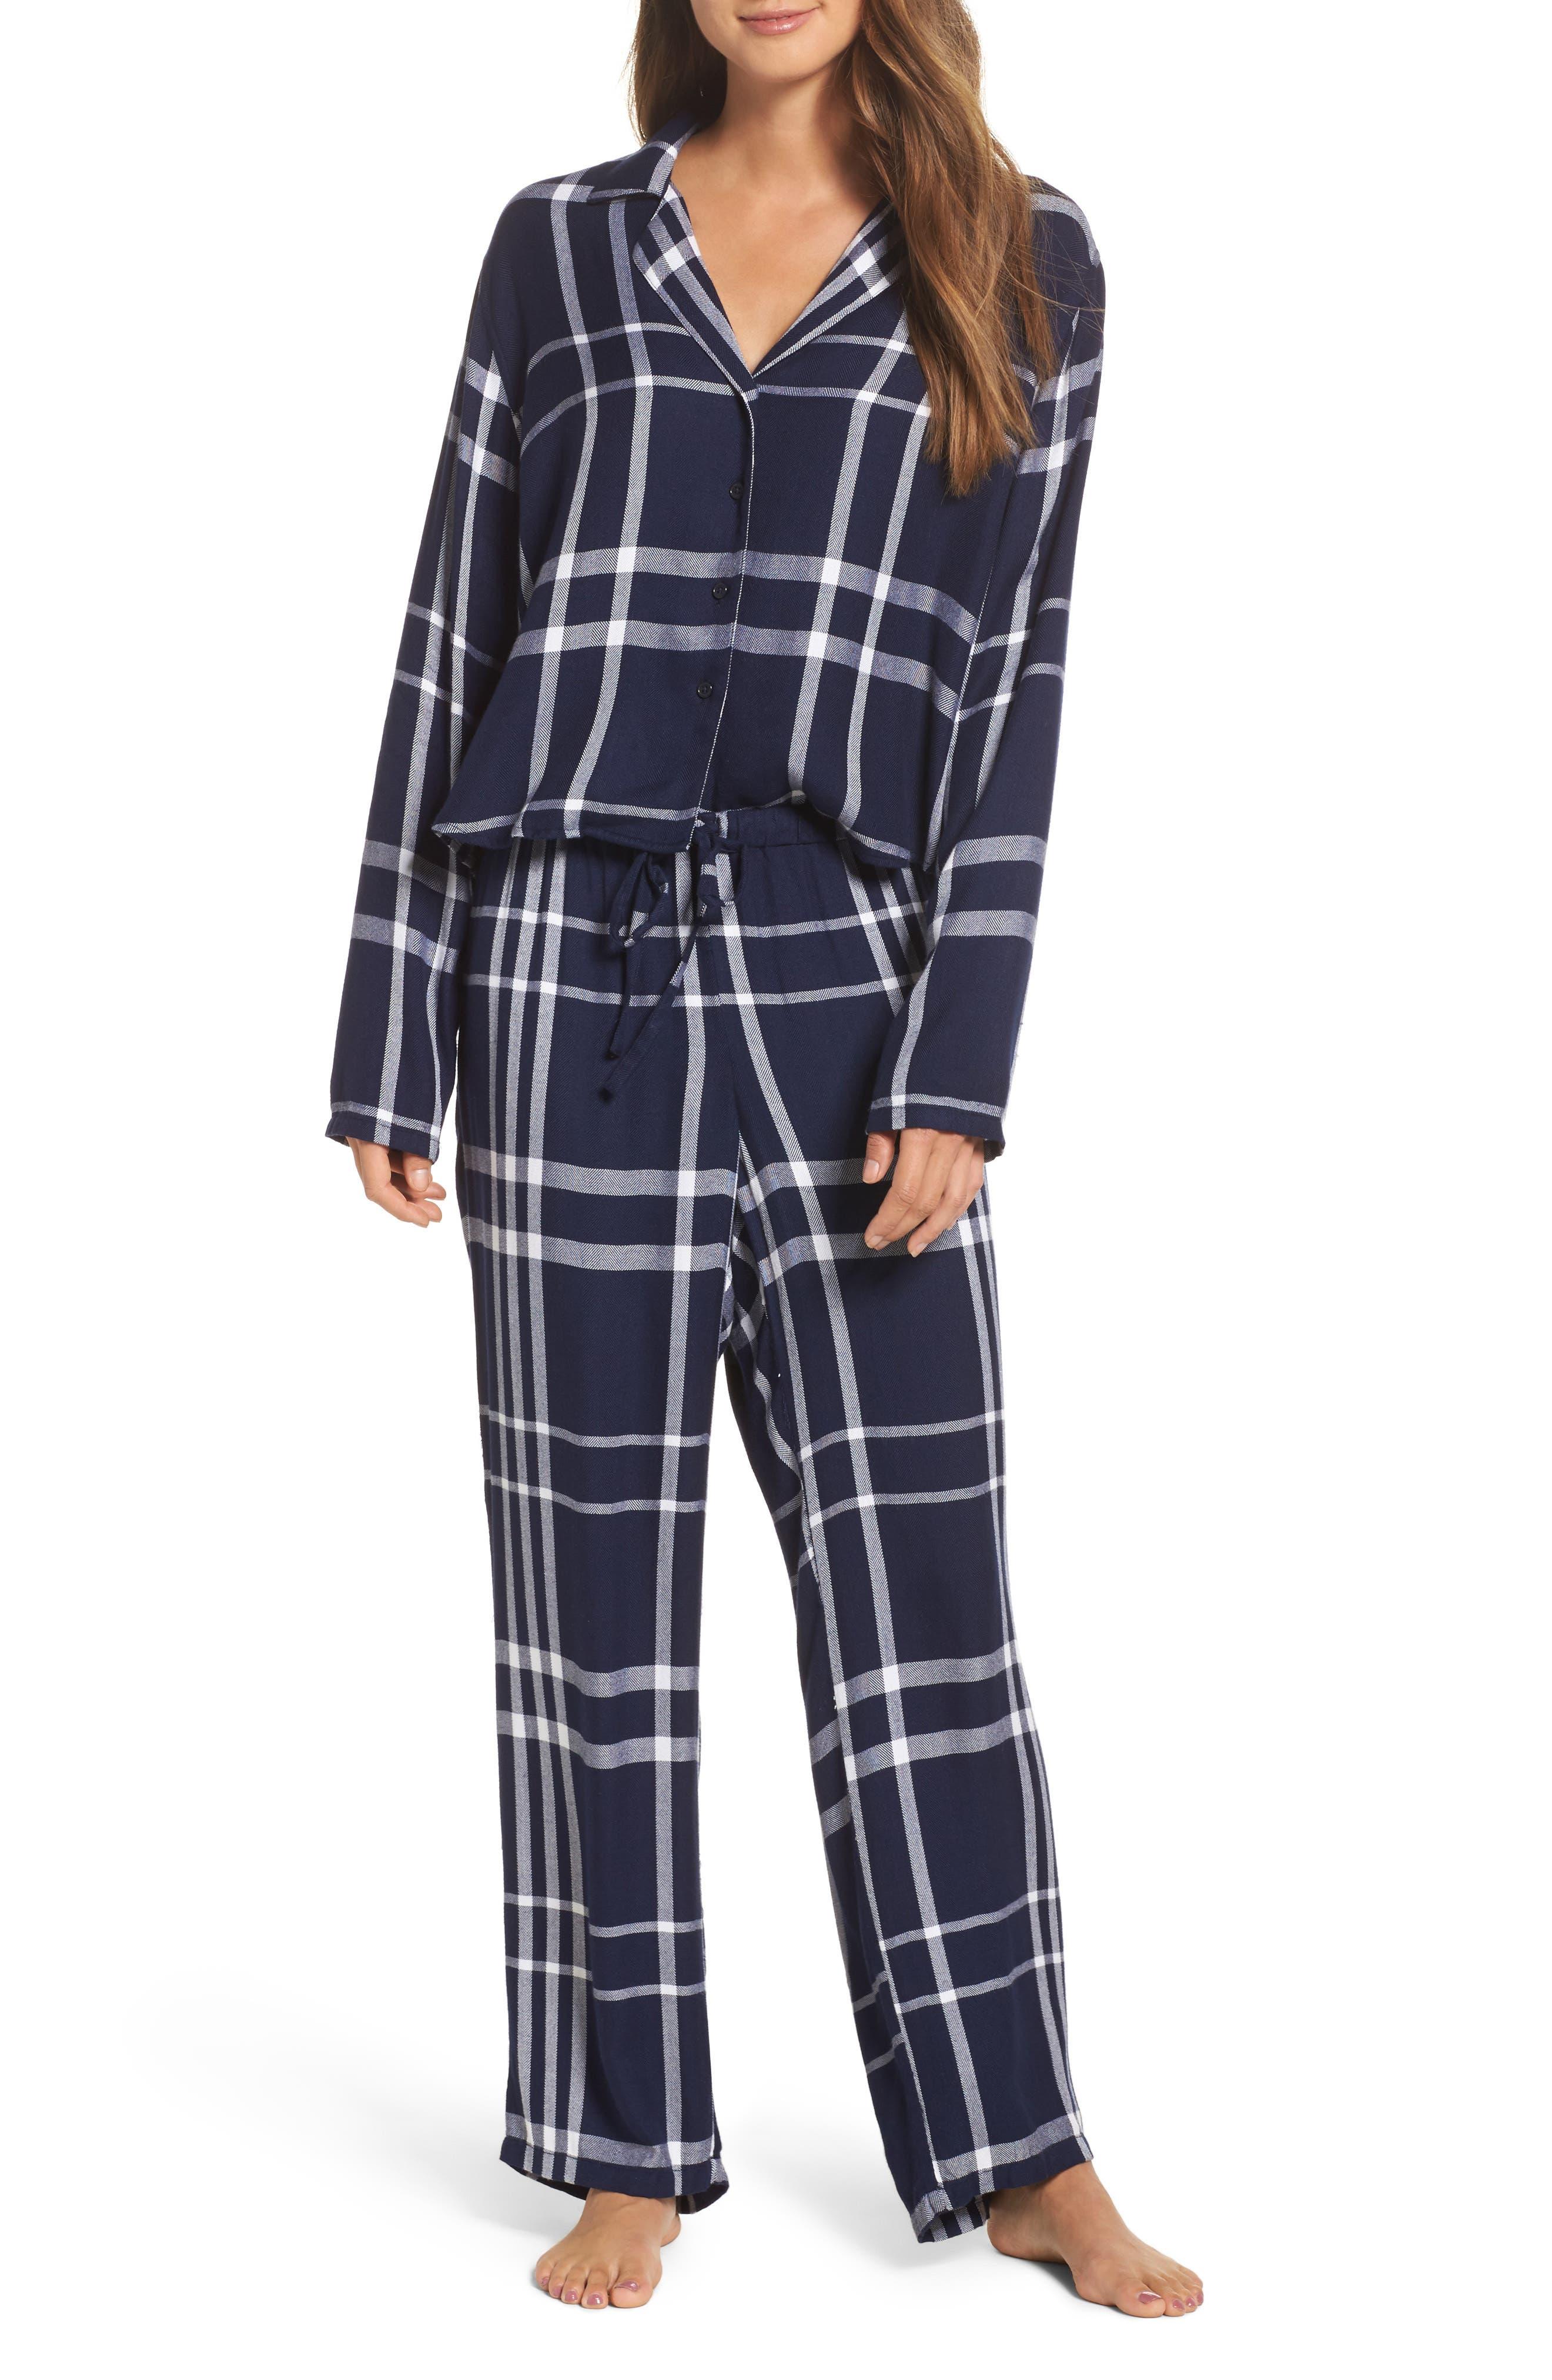 Plaid Pajamas,                             Main thumbnail 1, color,                             CADET/ WHITE